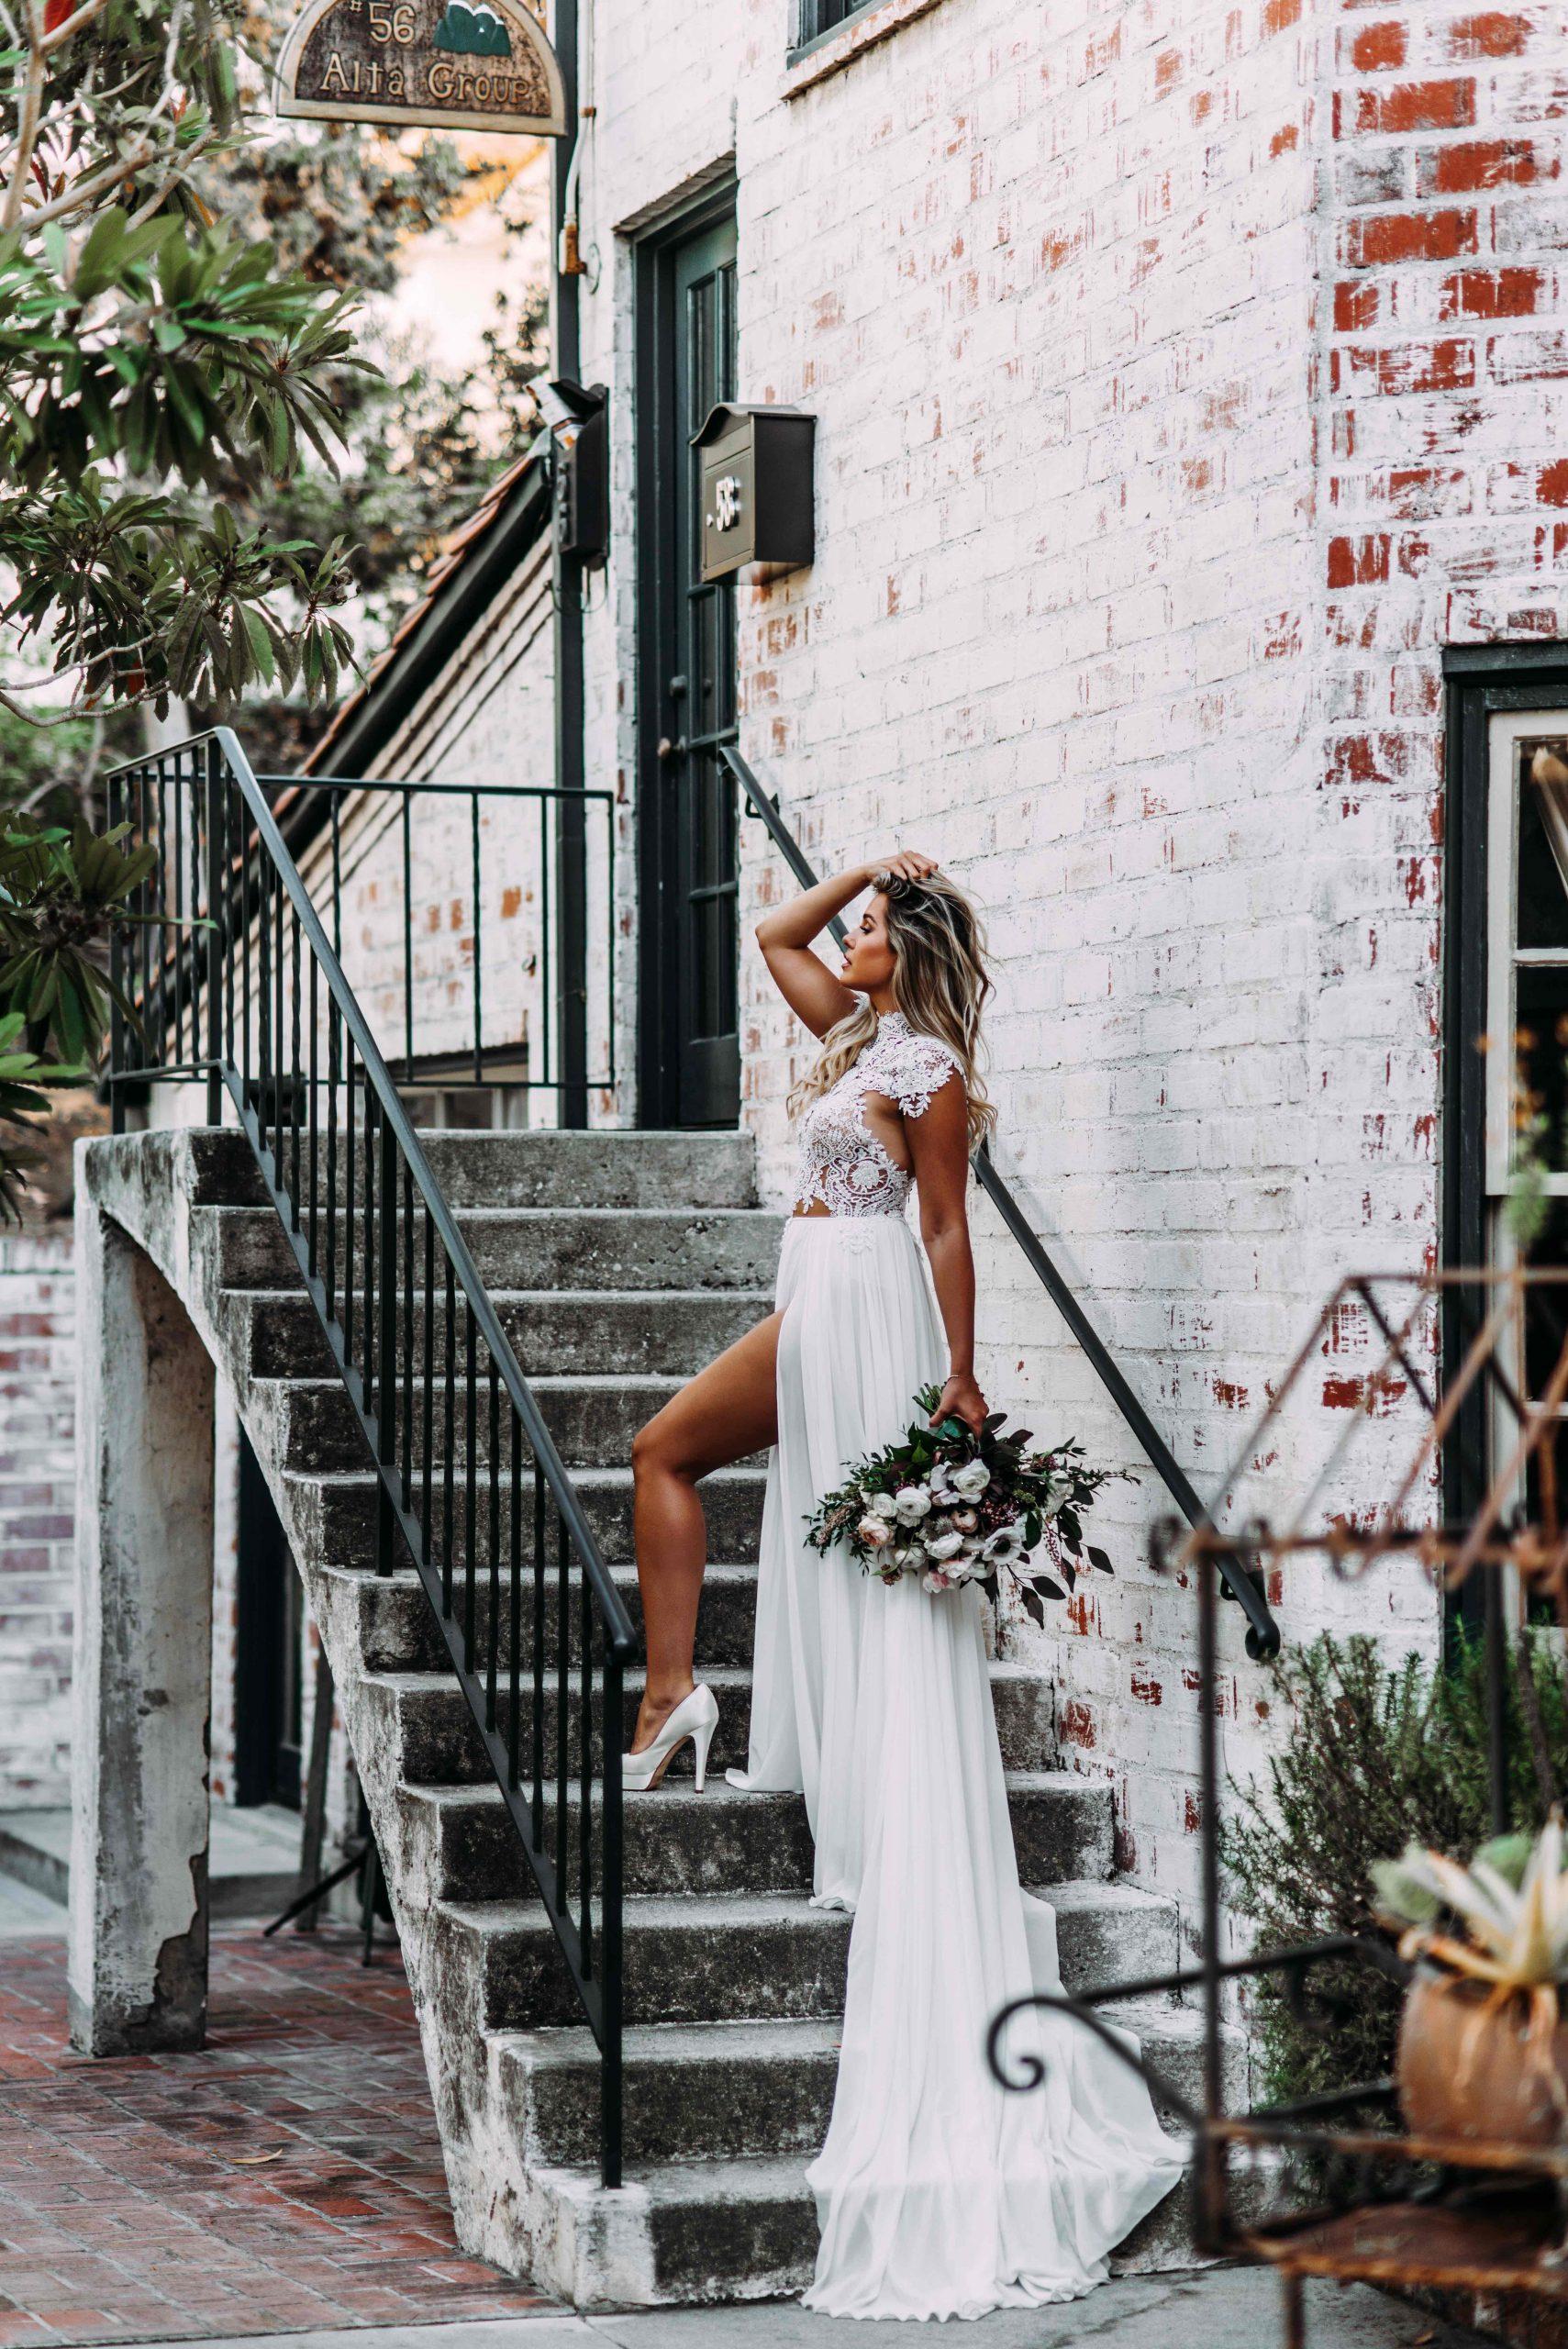 Best Wedding Photographer Los Angeles LifeStory.Film